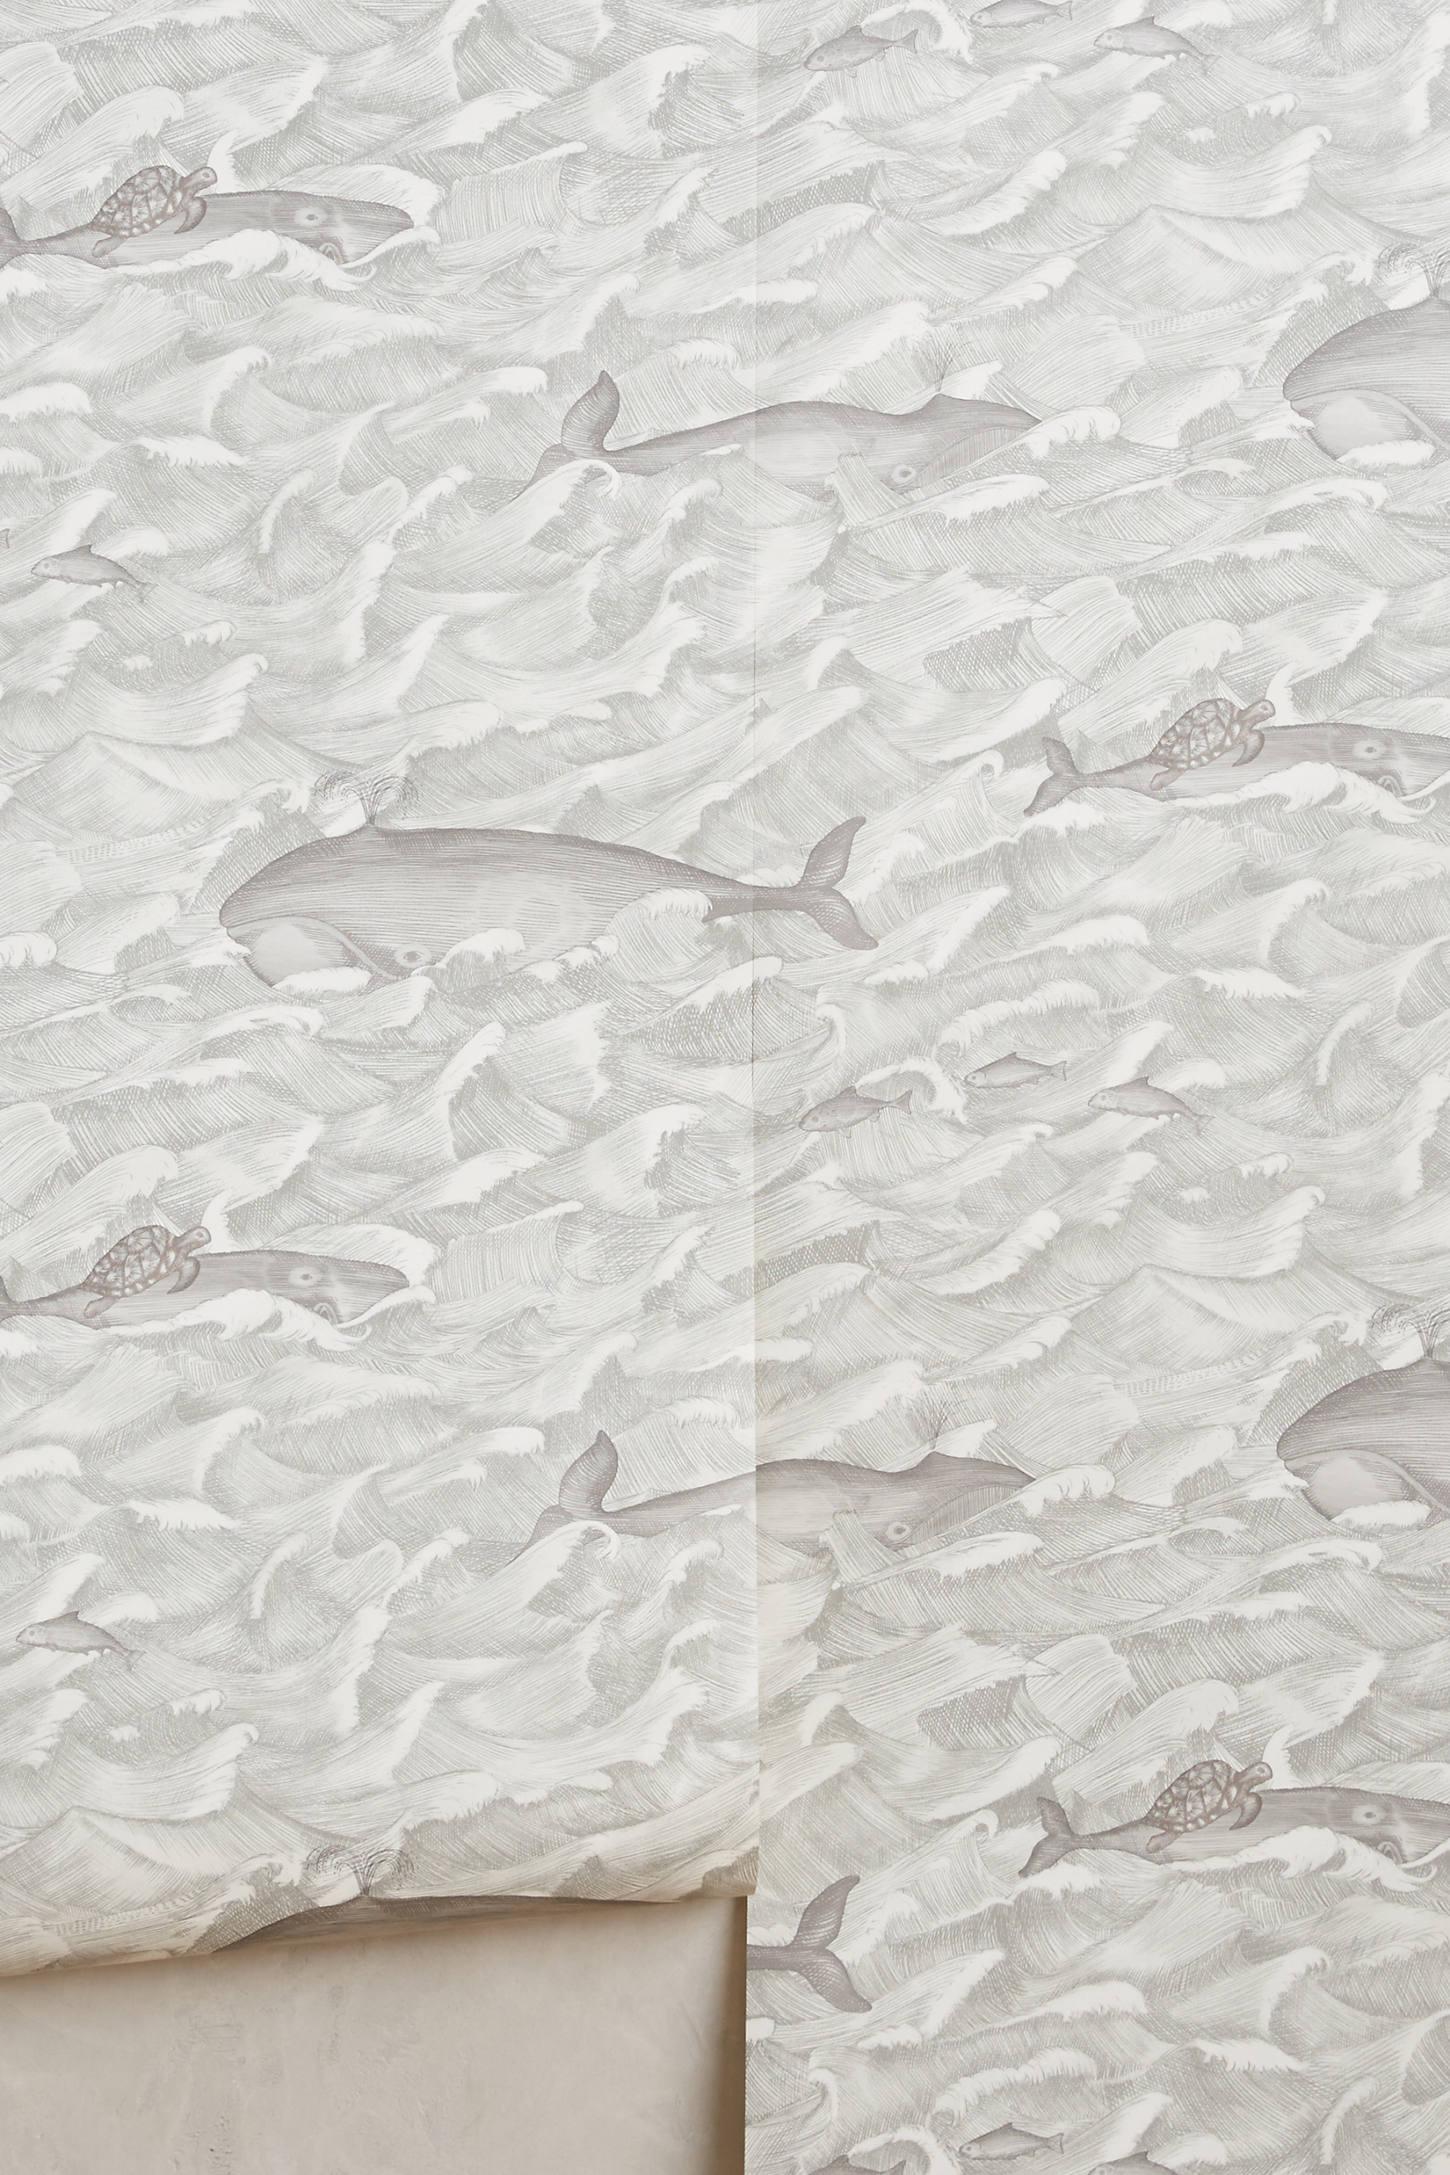 Whale Migration Wallpaper